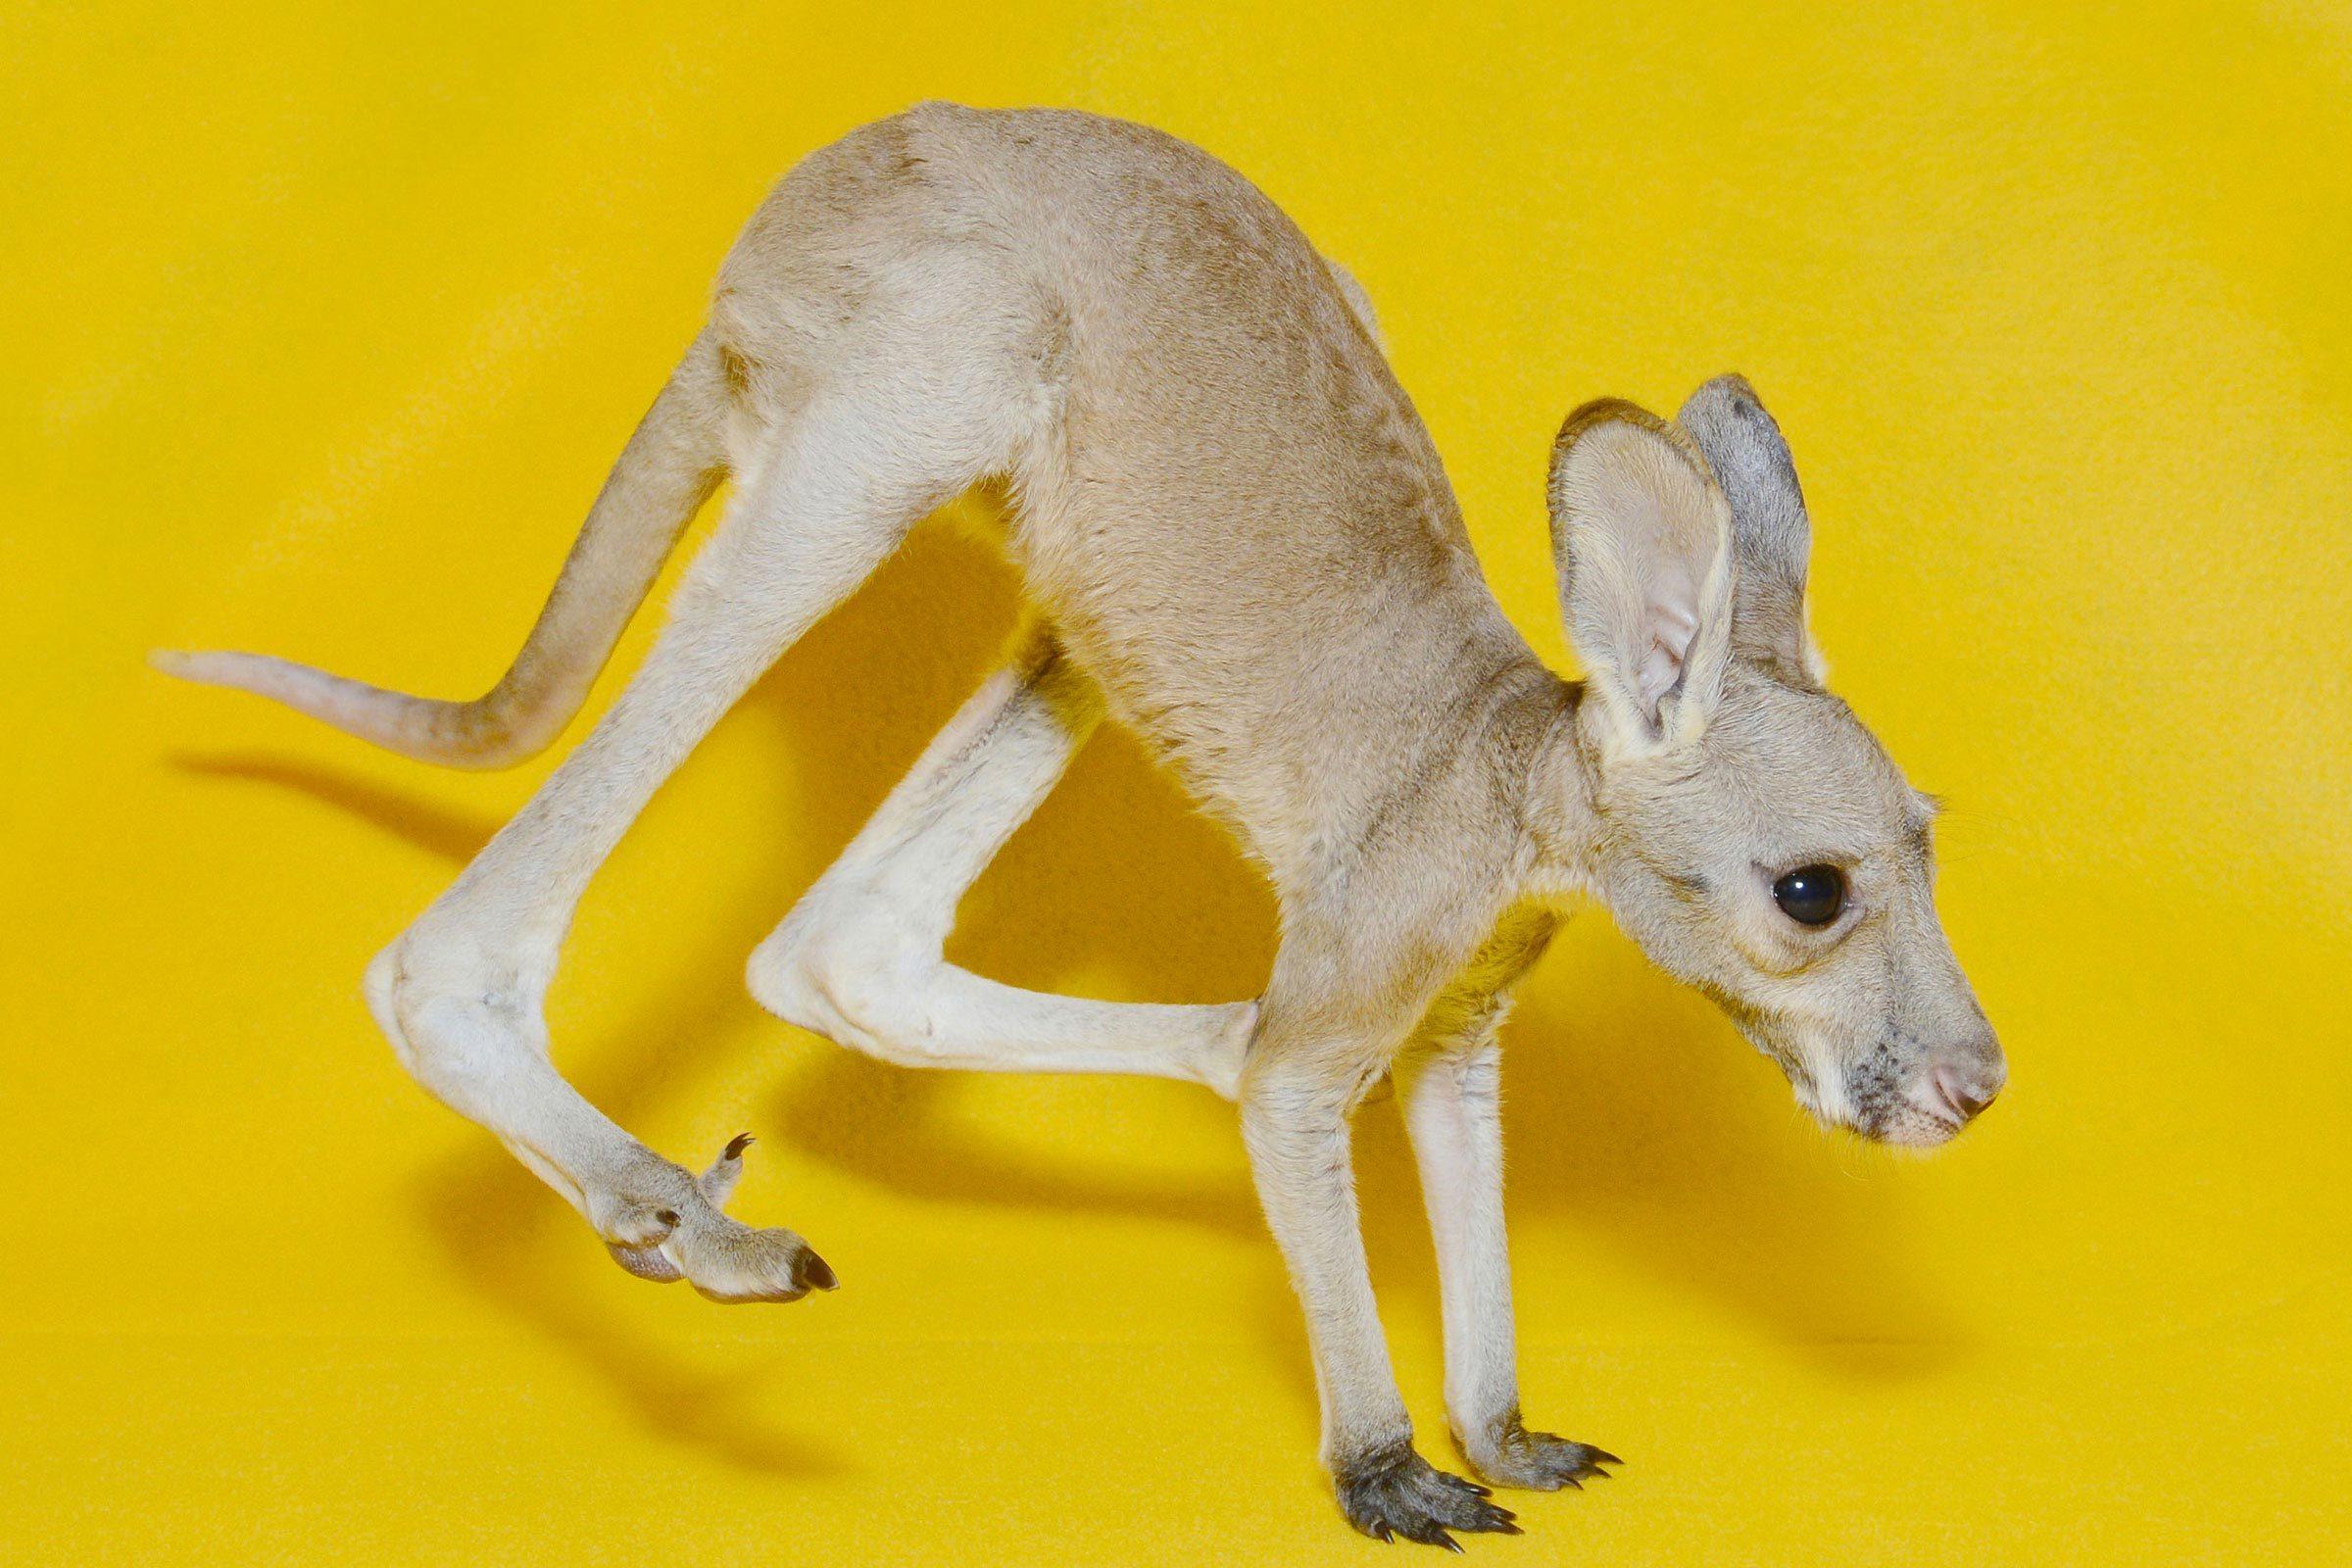 Bébé animaux : kangourou roux de 4 mois.